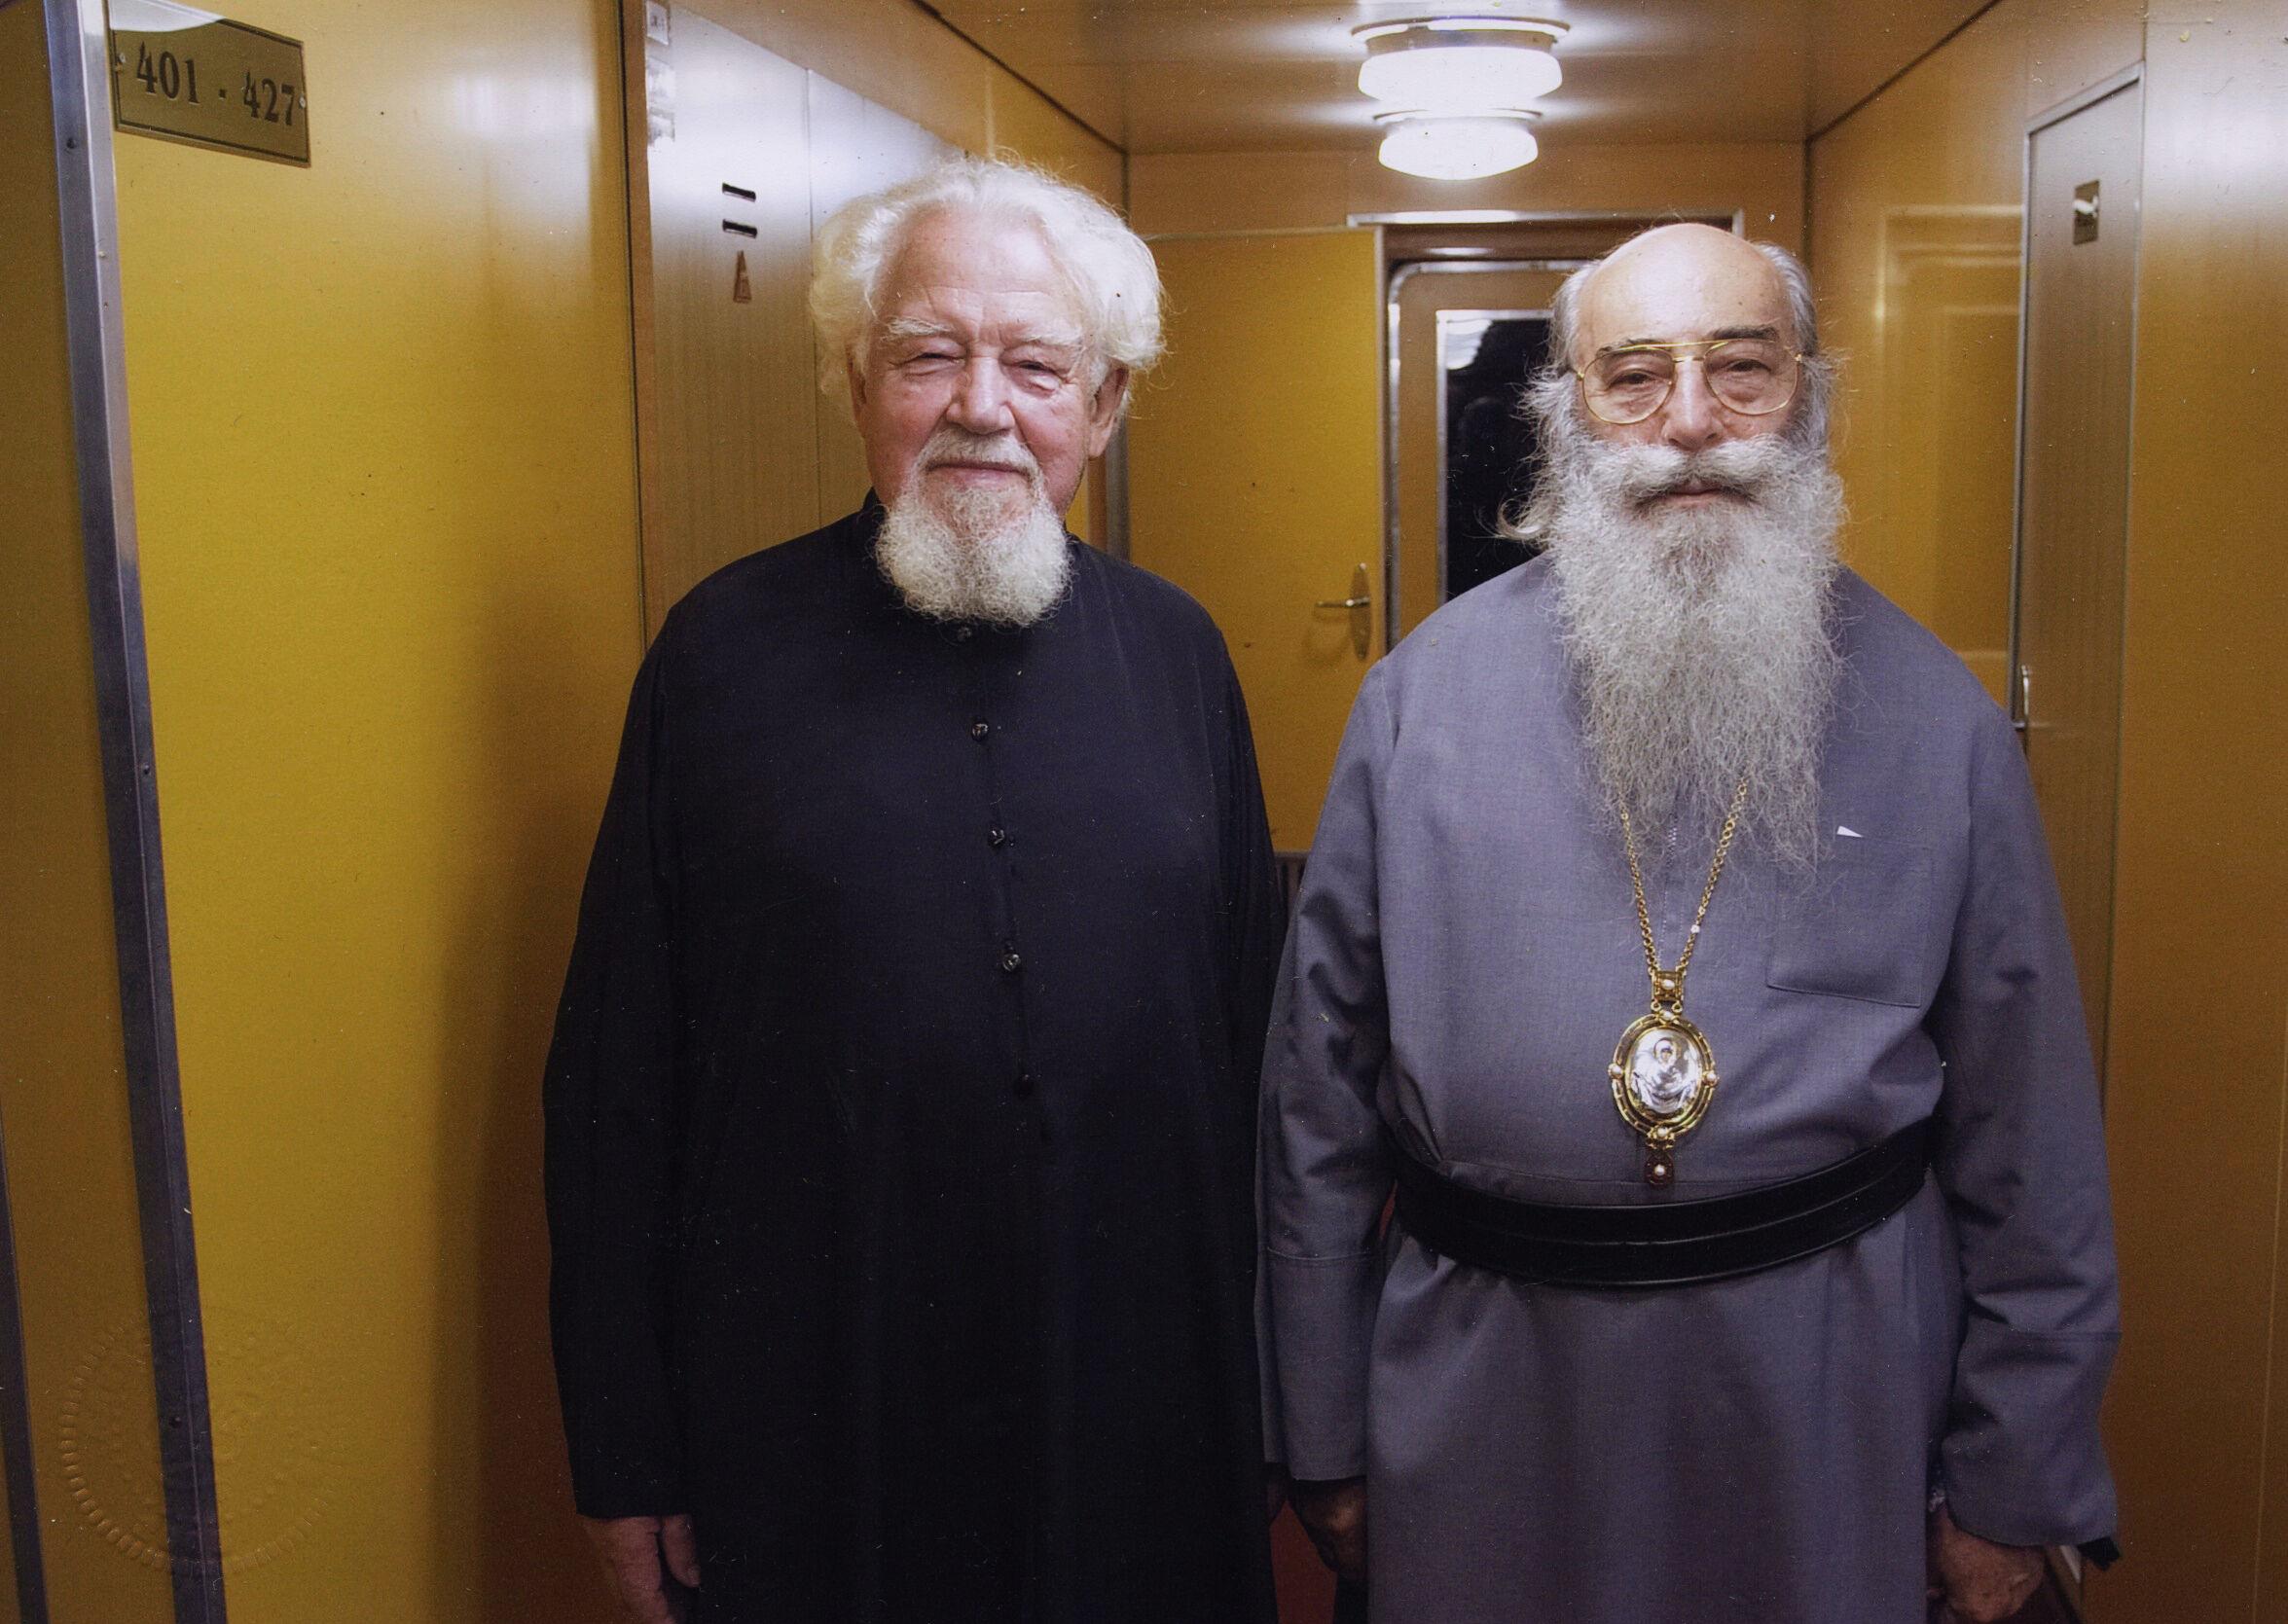 диакон патриарха кирилла